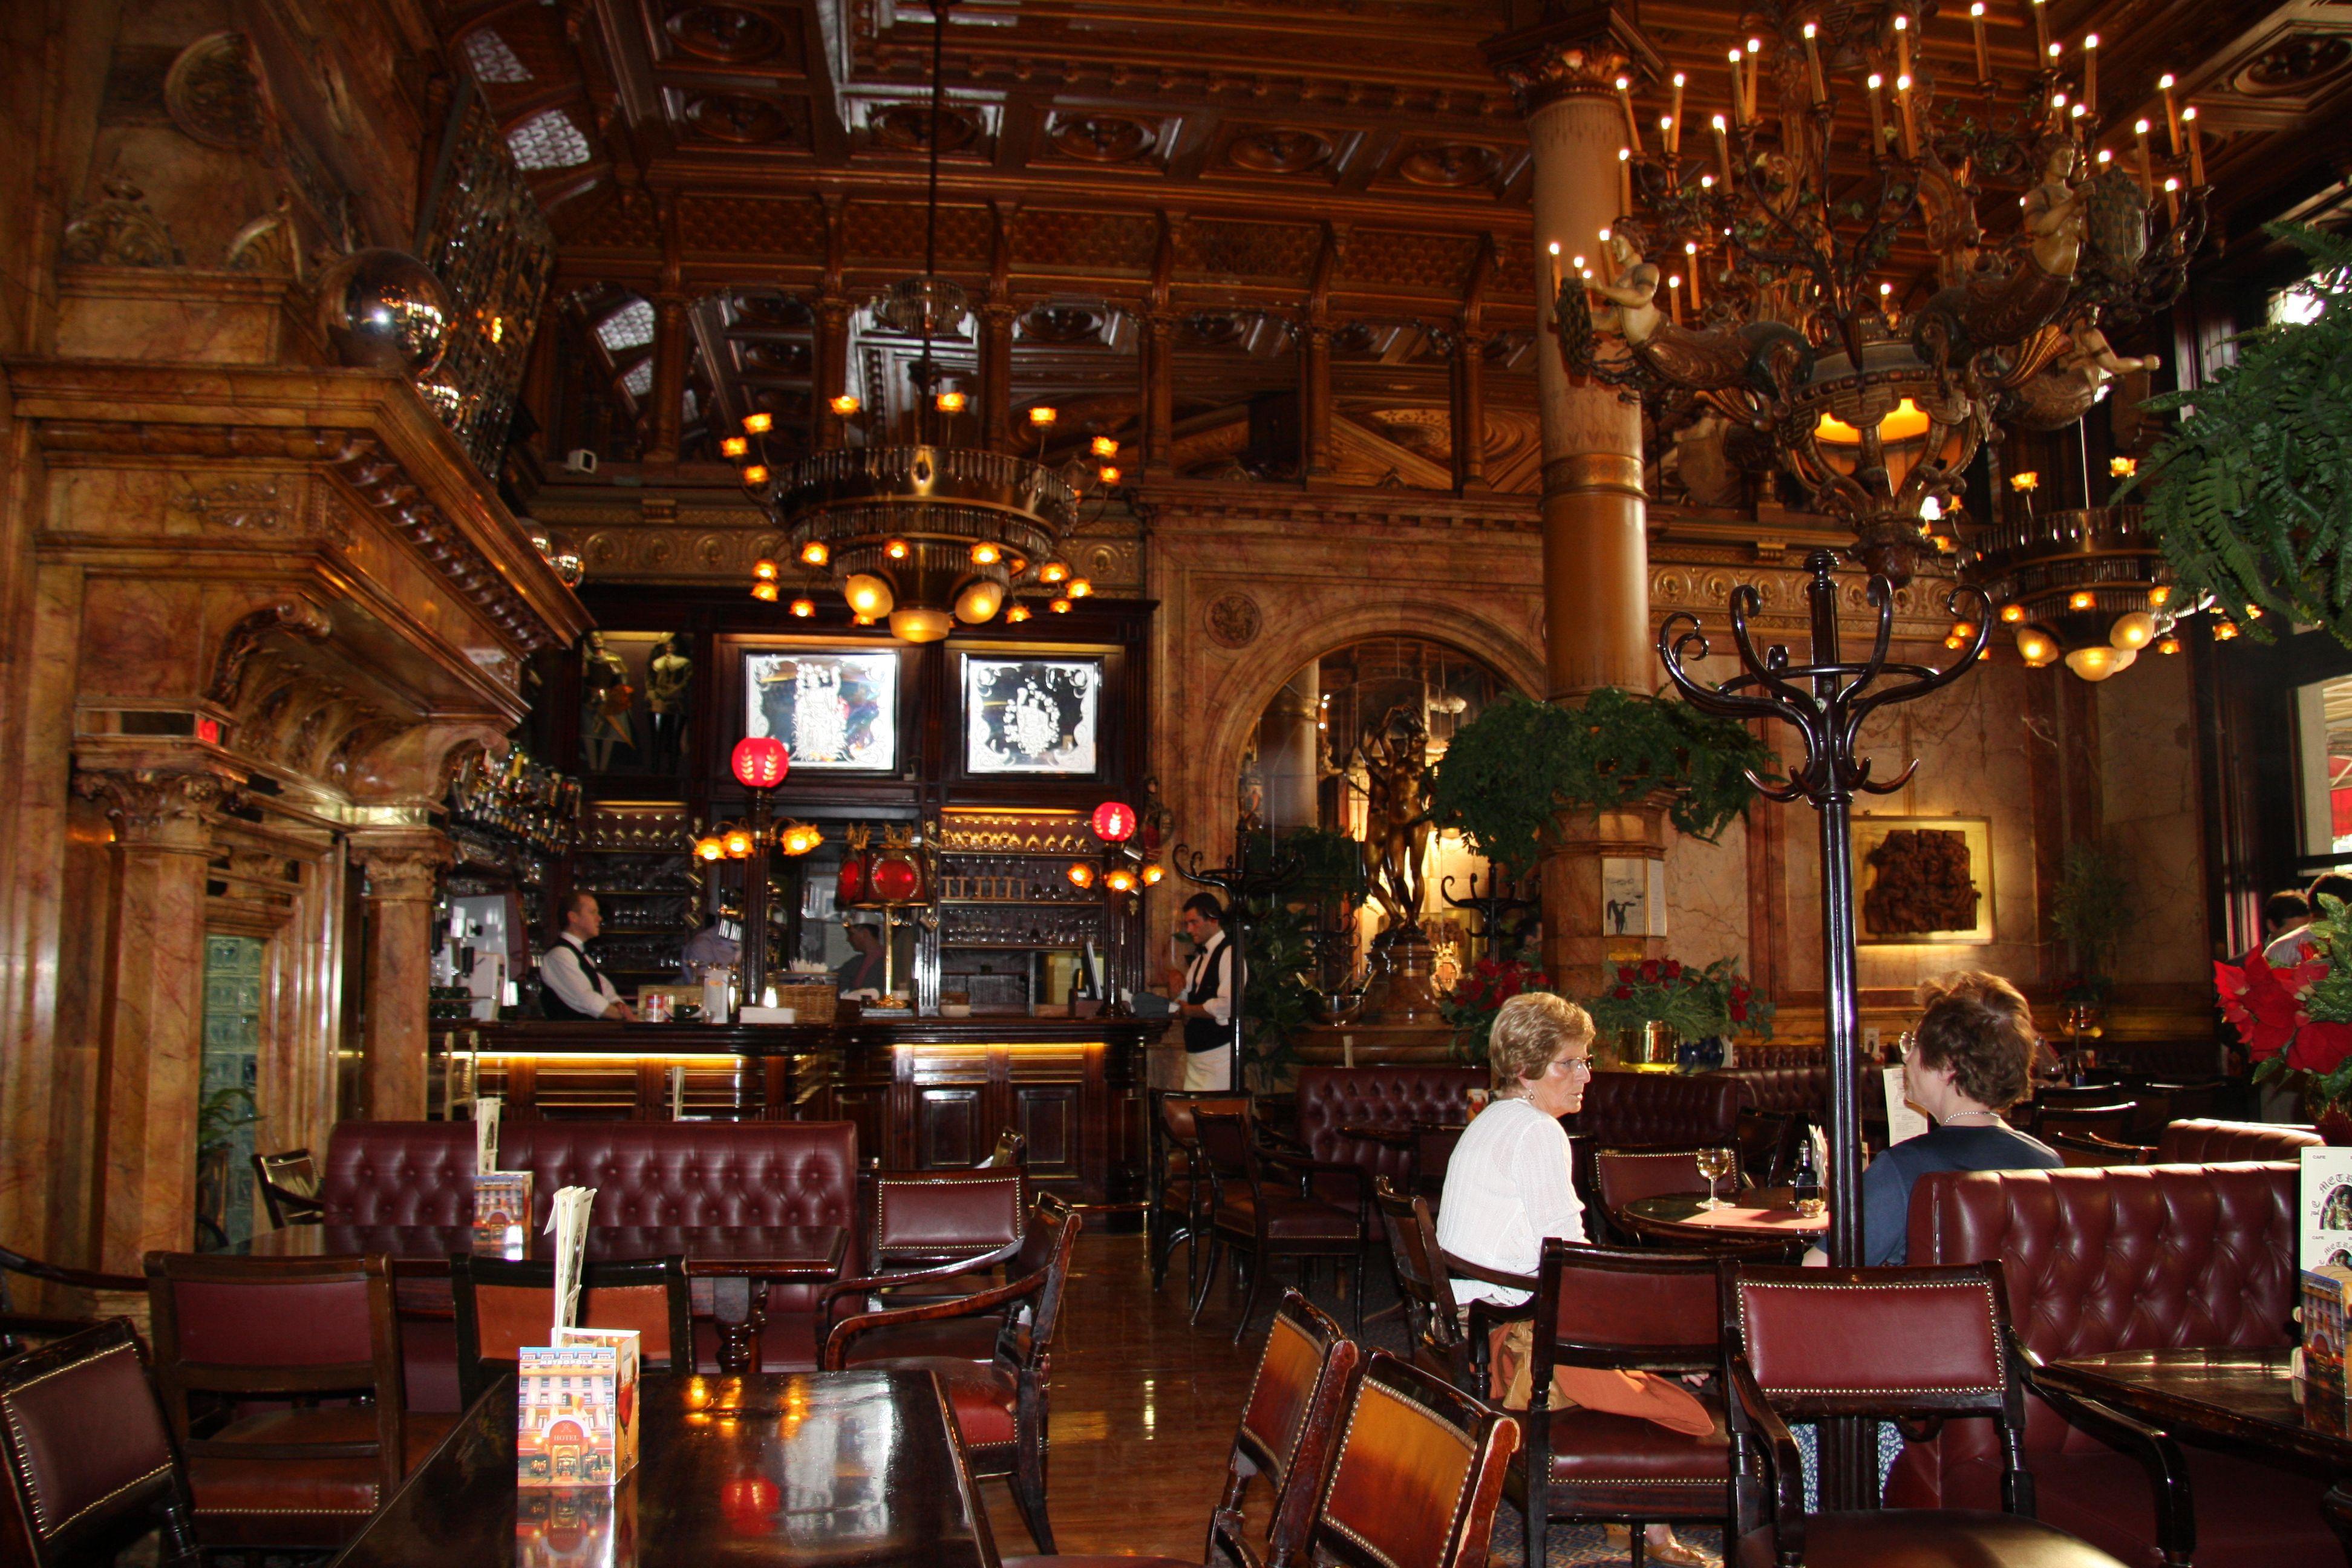 Inside cafe metropole in brussels allison rosick for Inside in french